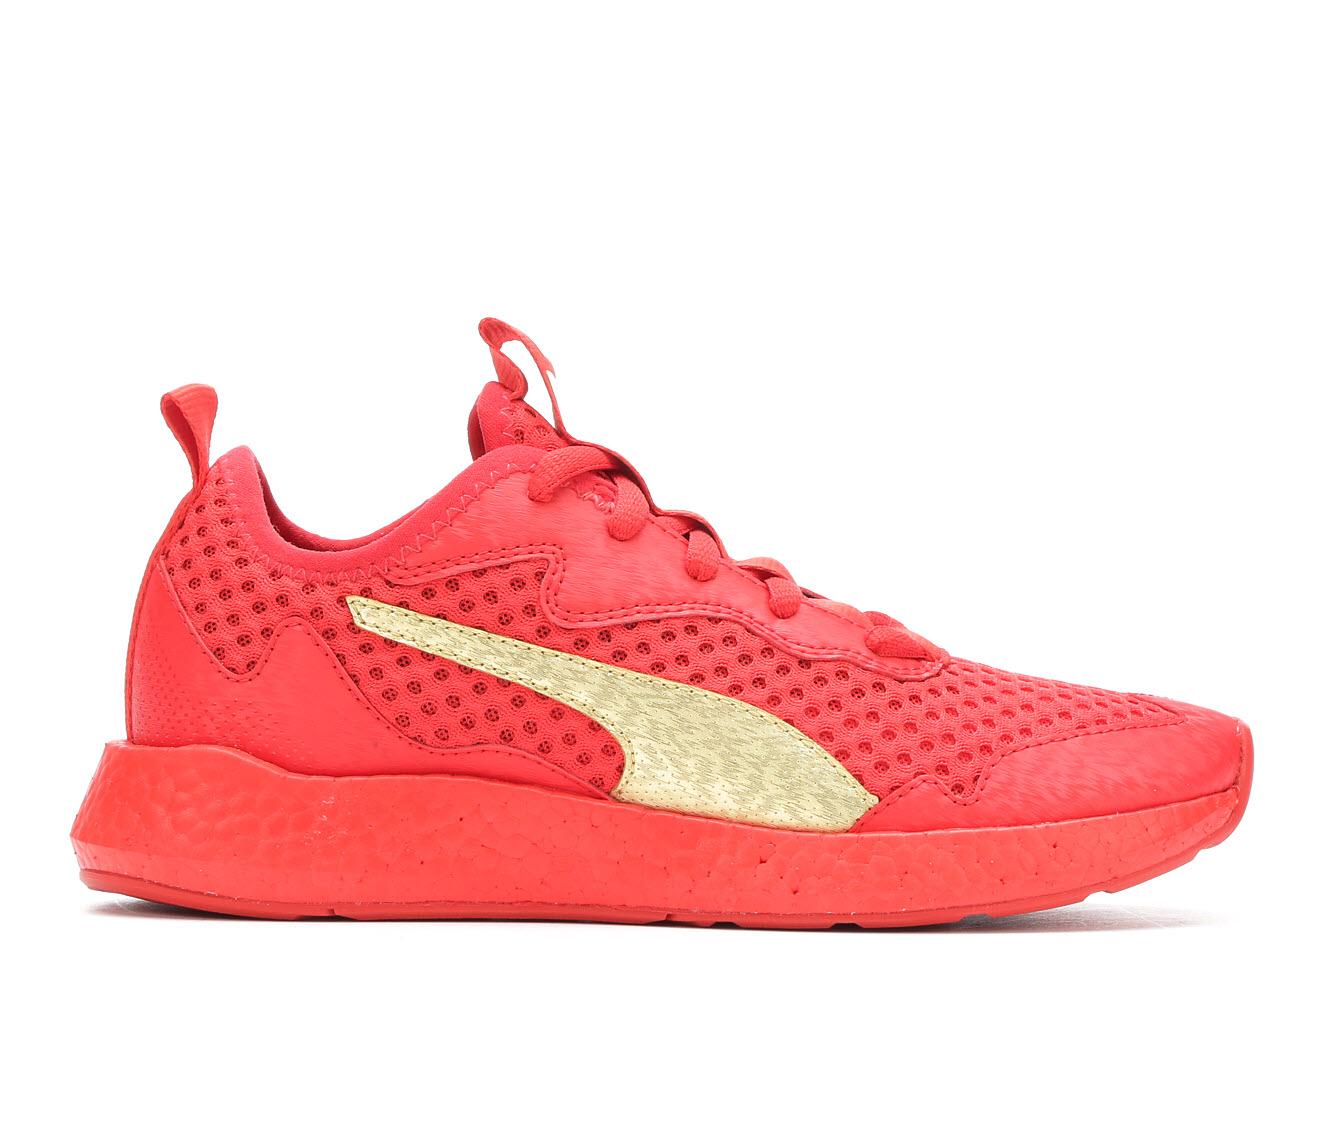 Puma NRGY Neko Skim Metallic Women's Athletic Shoe (Red)